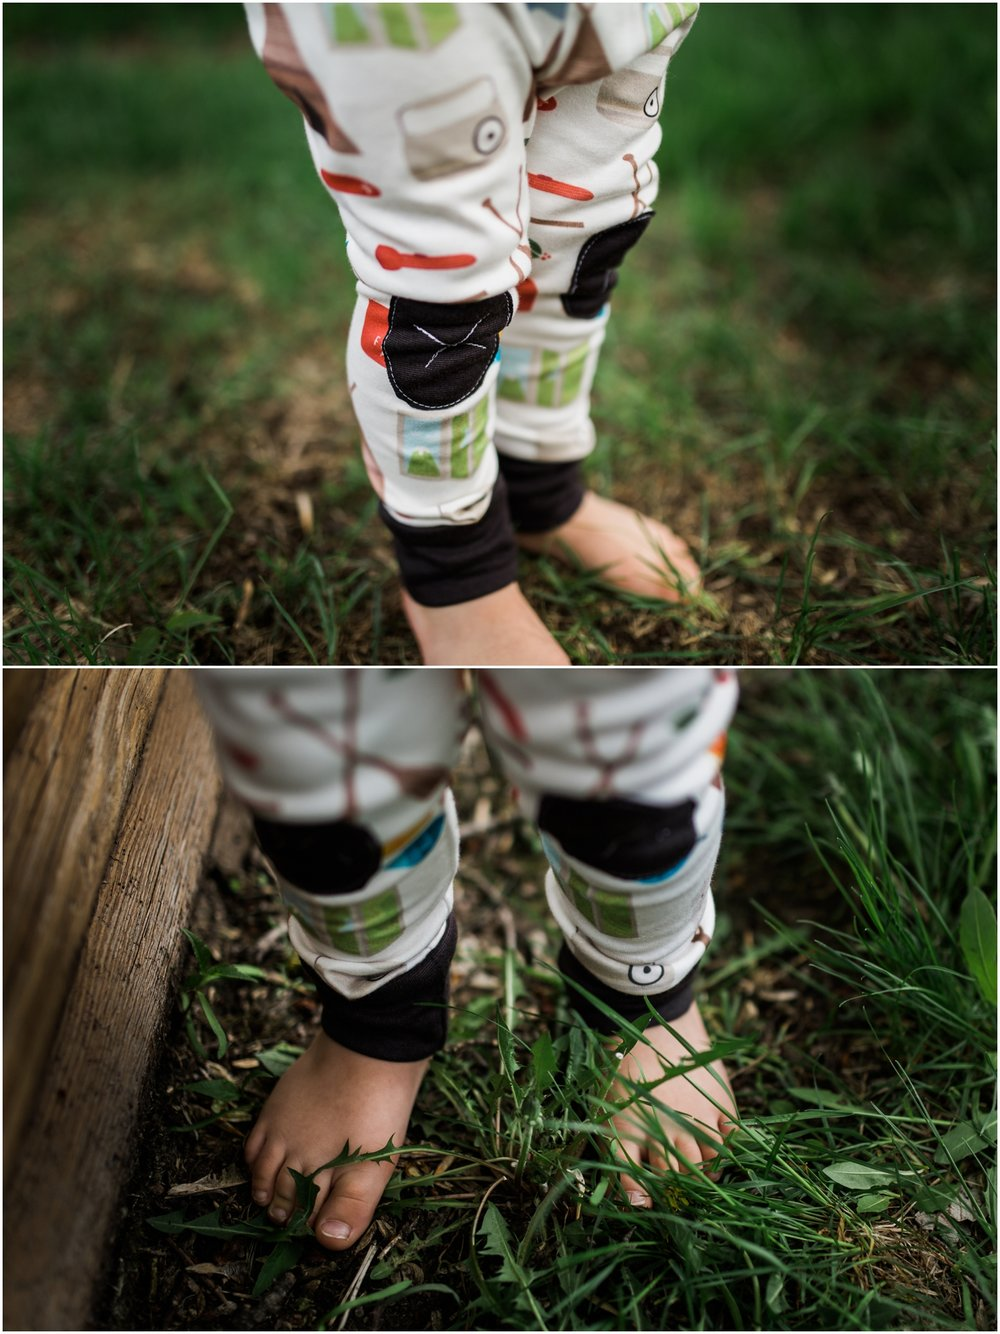 Edmonton Family Photographer - Treelines Photography - Alpine Baby Co. - Adventure Leggings - Organic Clothing